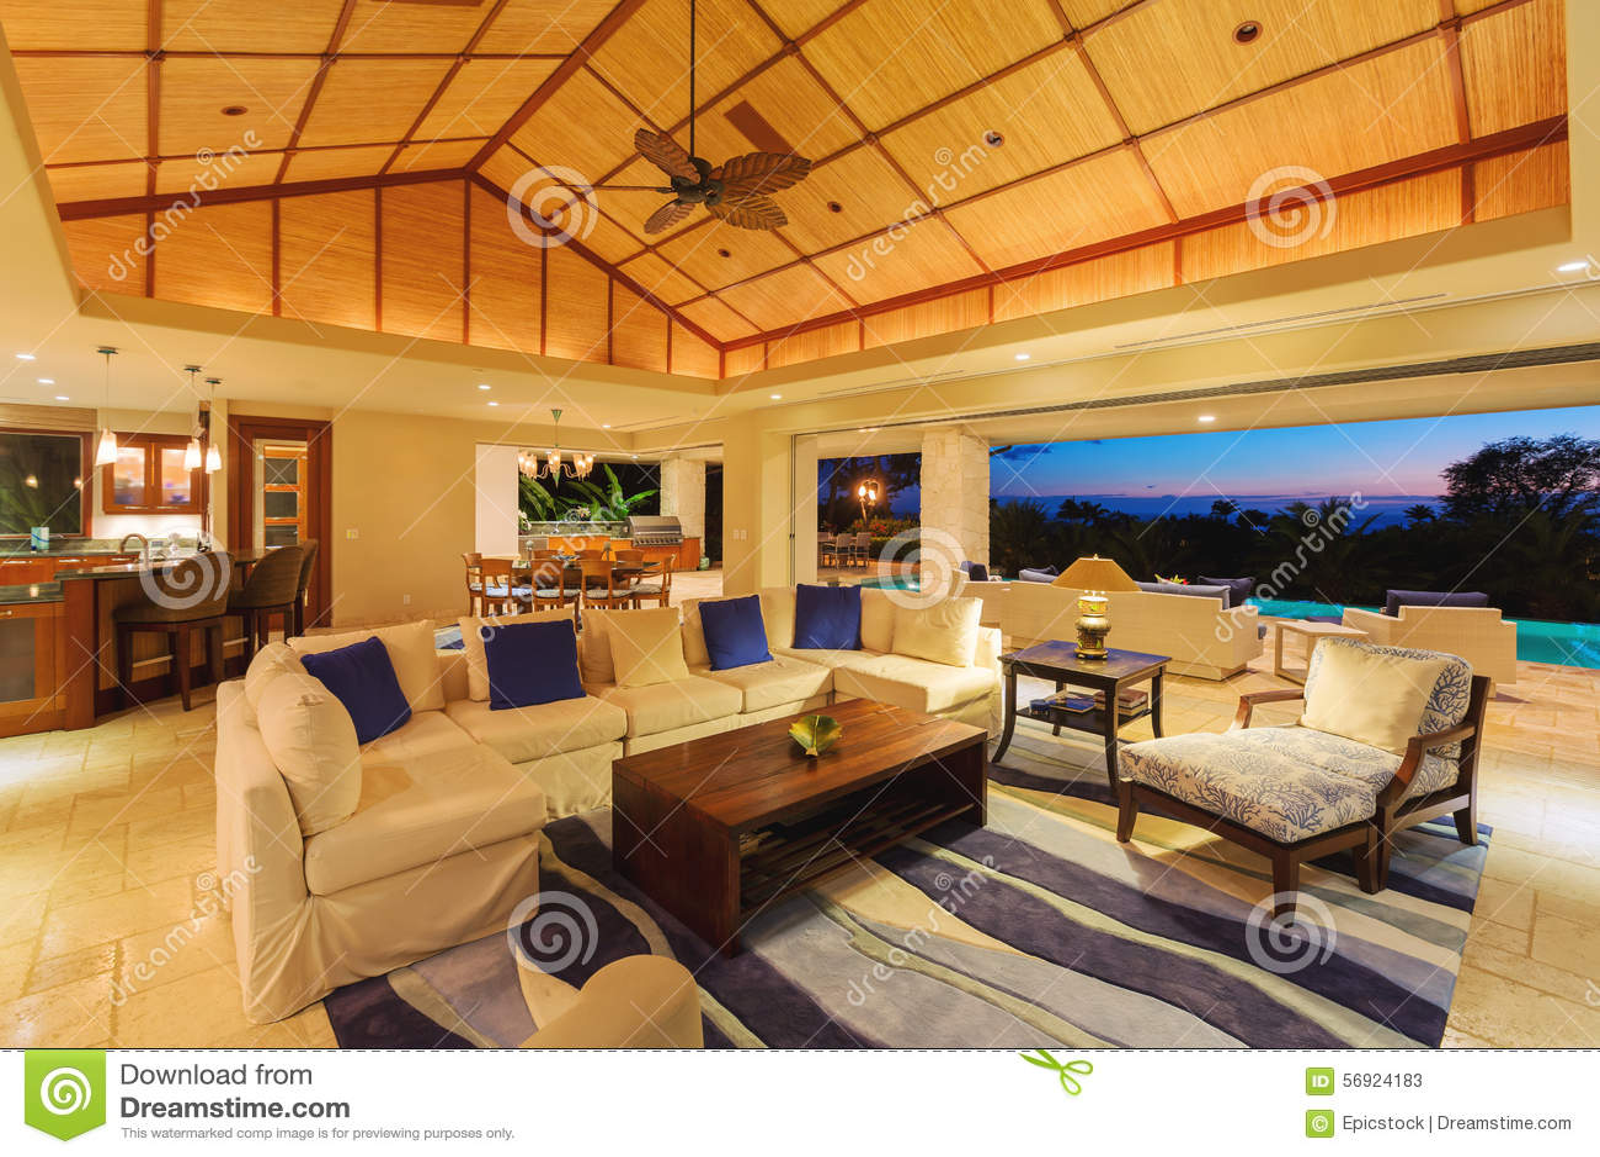 Home living luxury room